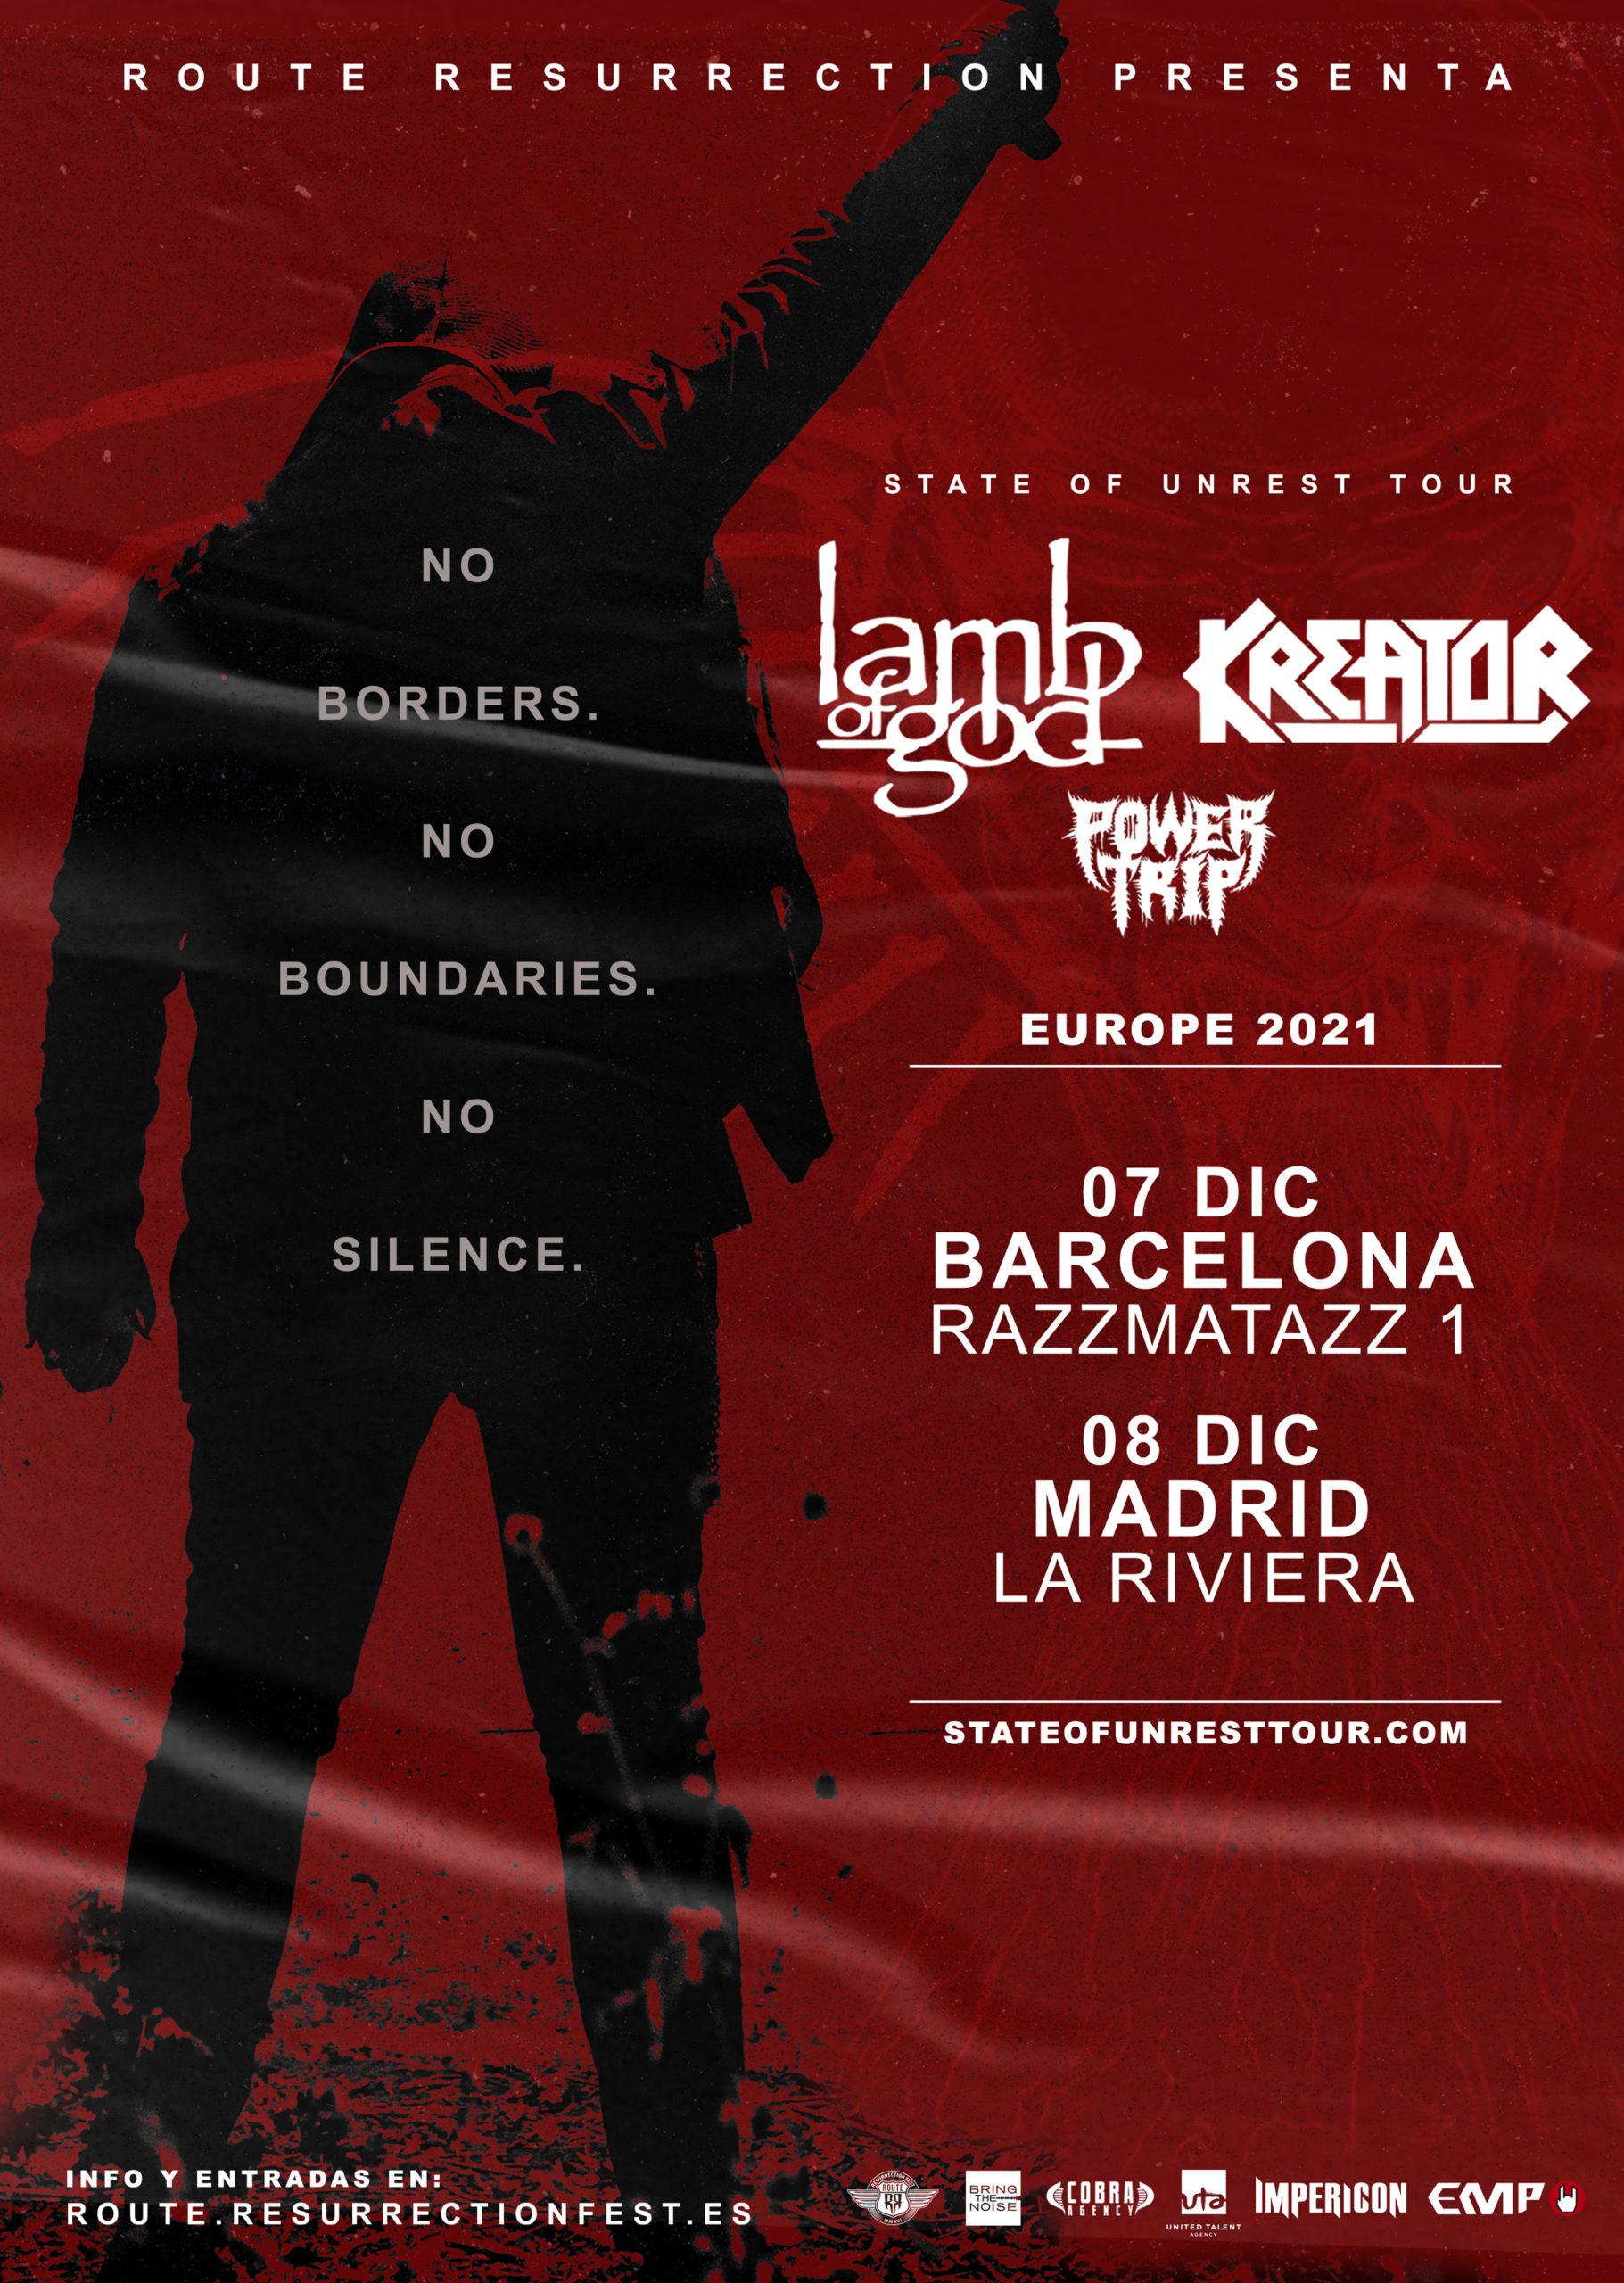 Route Resurrection 2021: Lamb of God y Kreator (Barcelona)